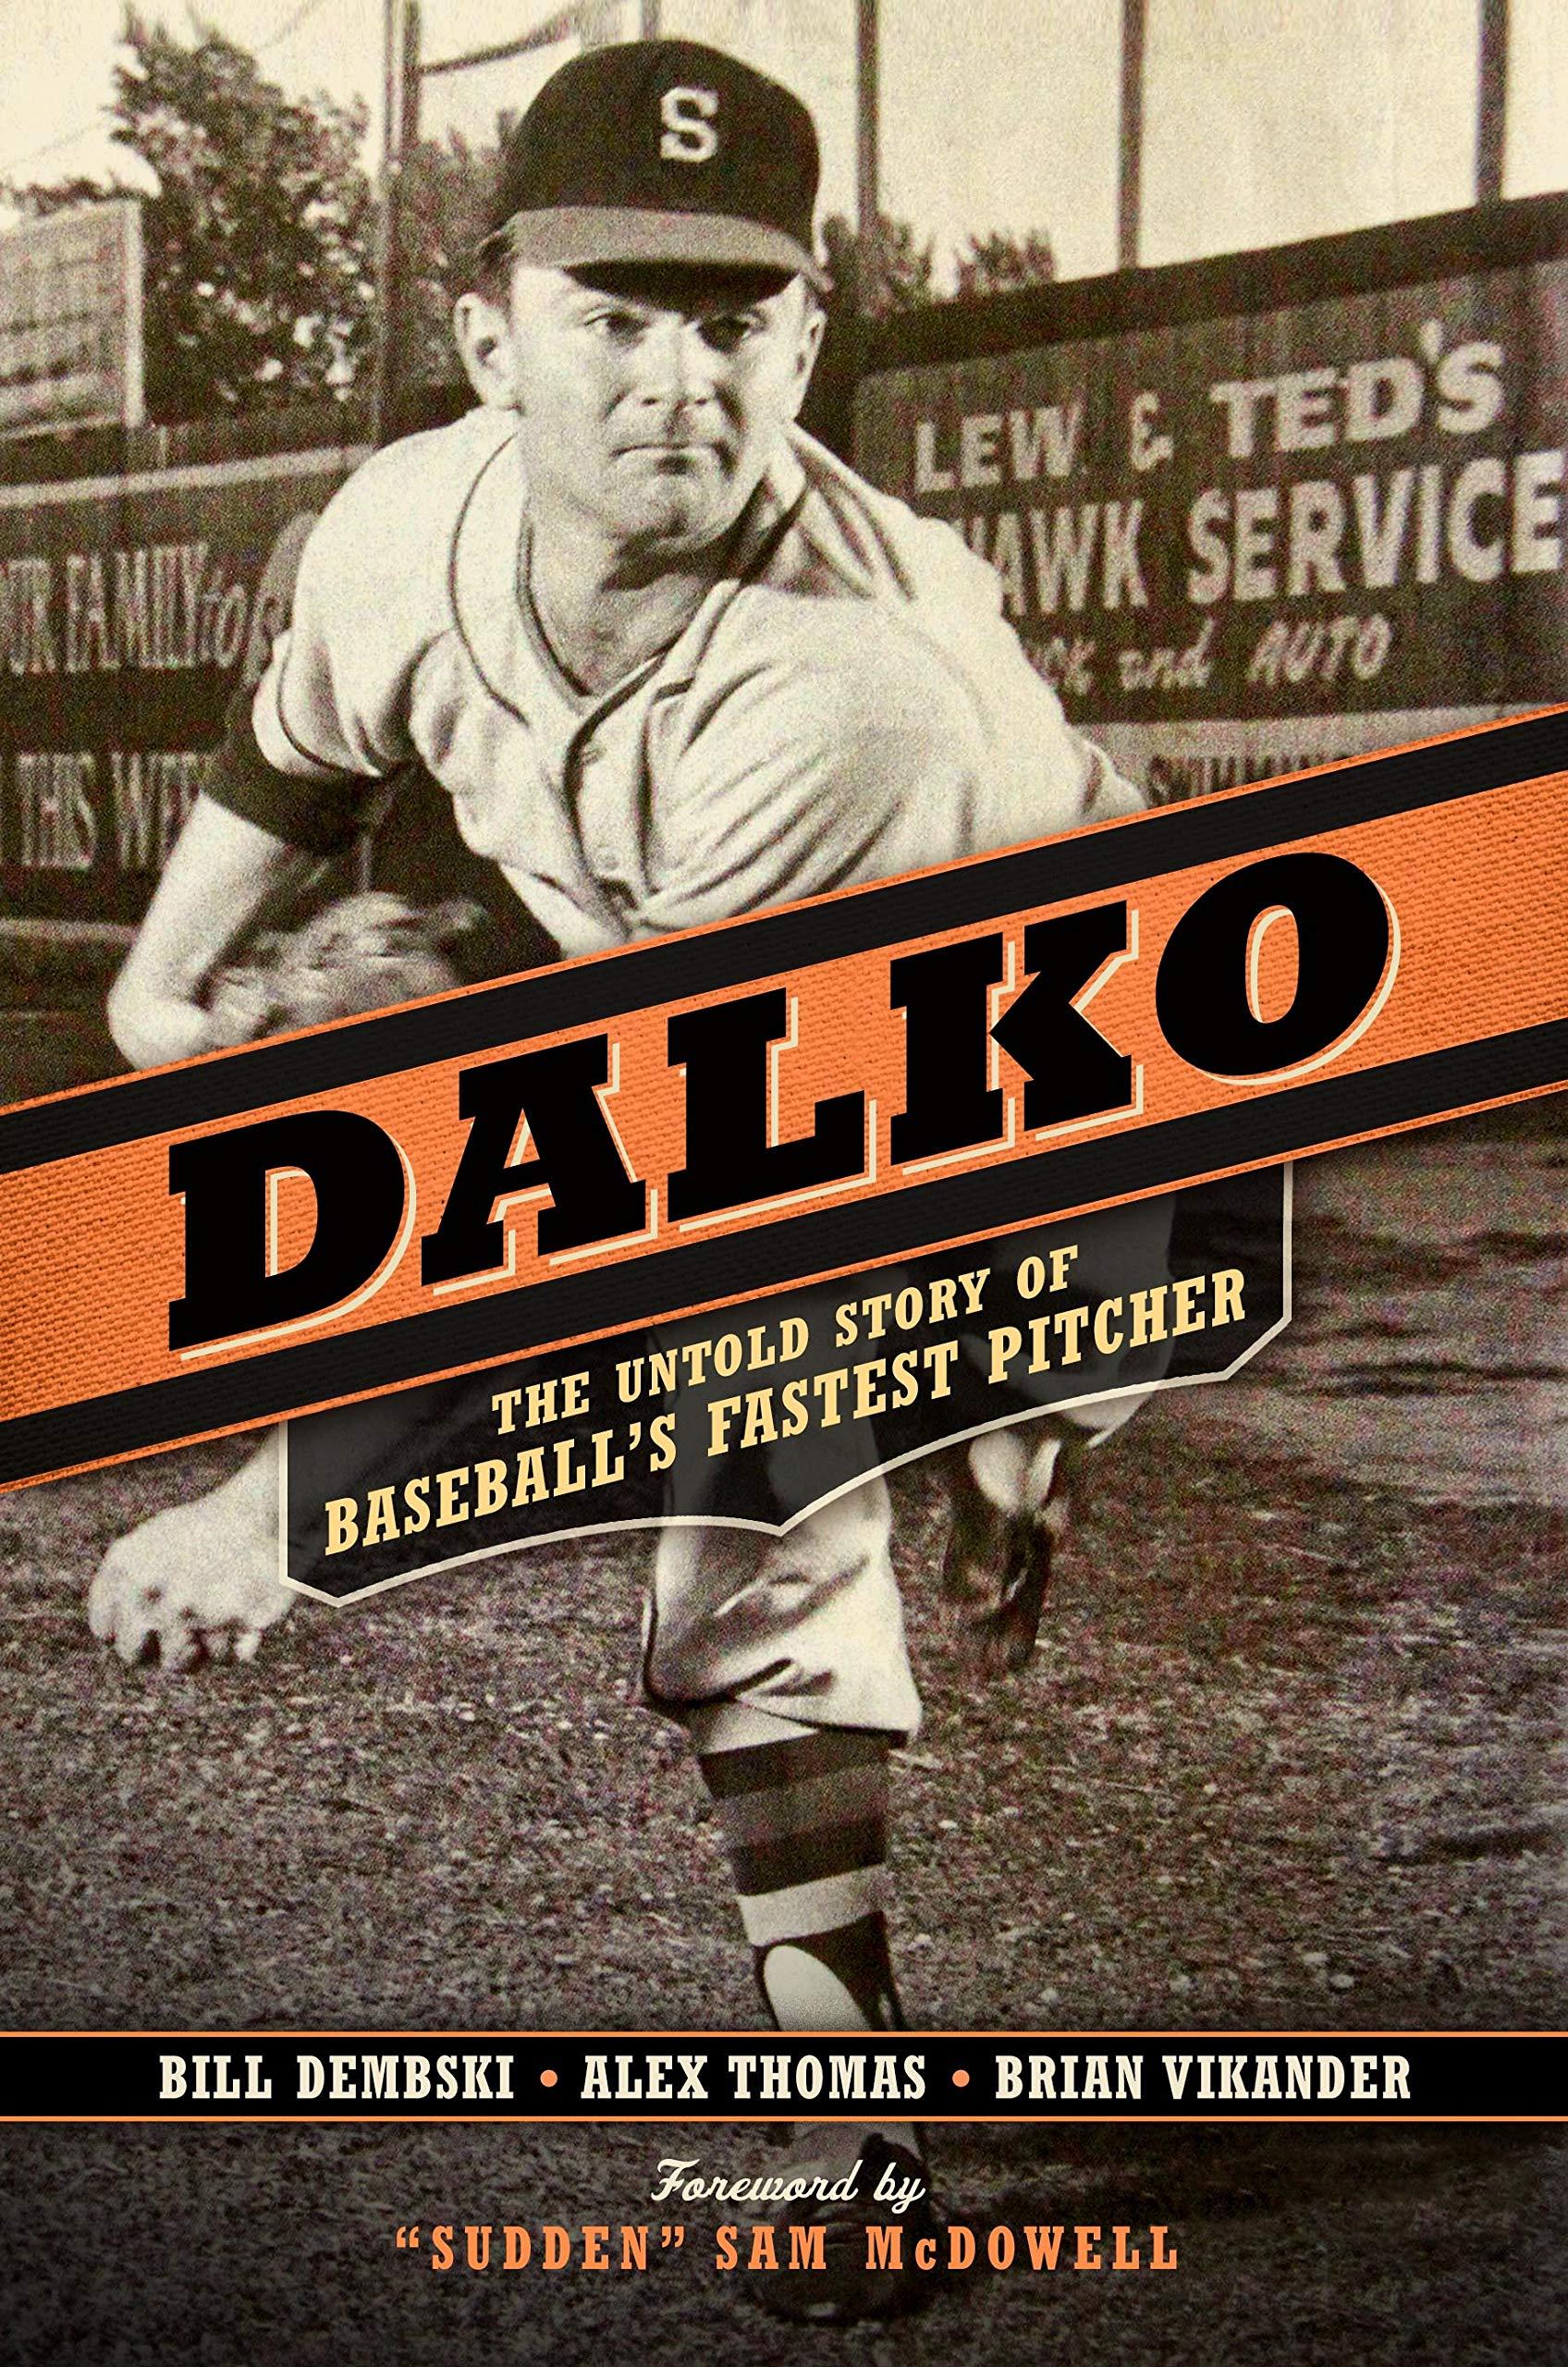 Dalko: The Untold Story of Baseballs Fastest Pitcher: Amazon ...